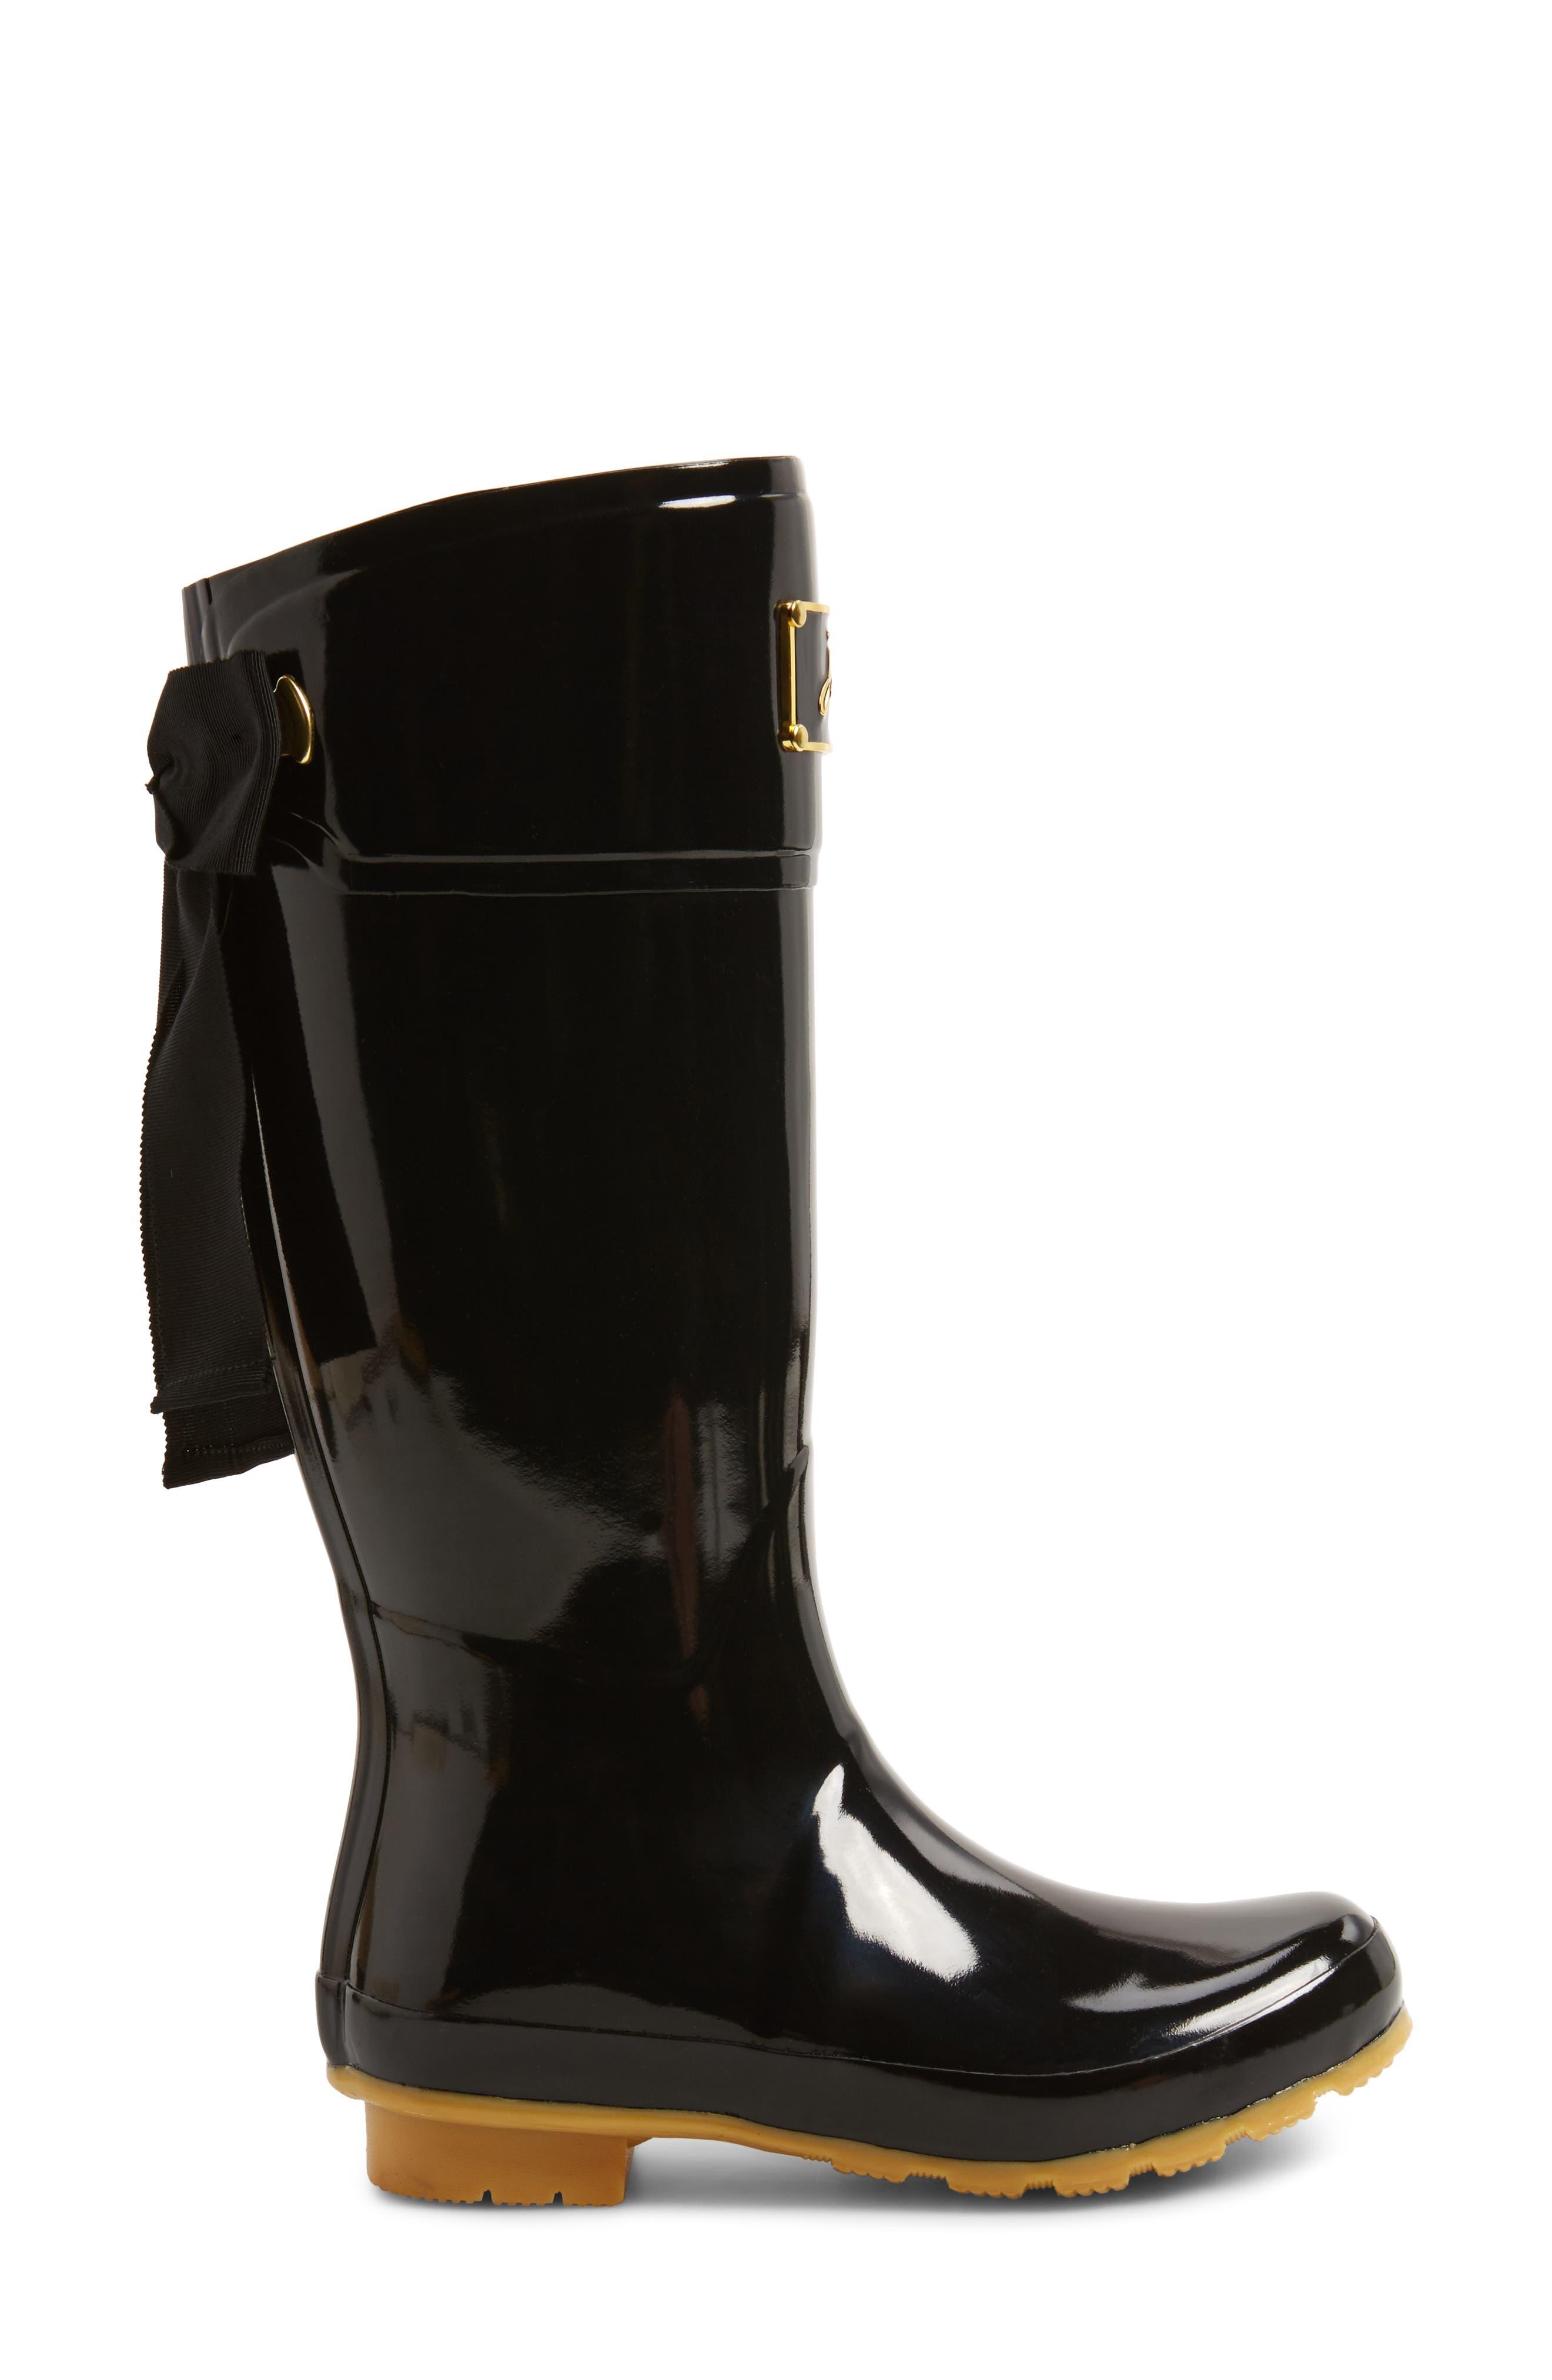 Alternate Image 3  - Joules 'Evedon' Rain Boot (Women)